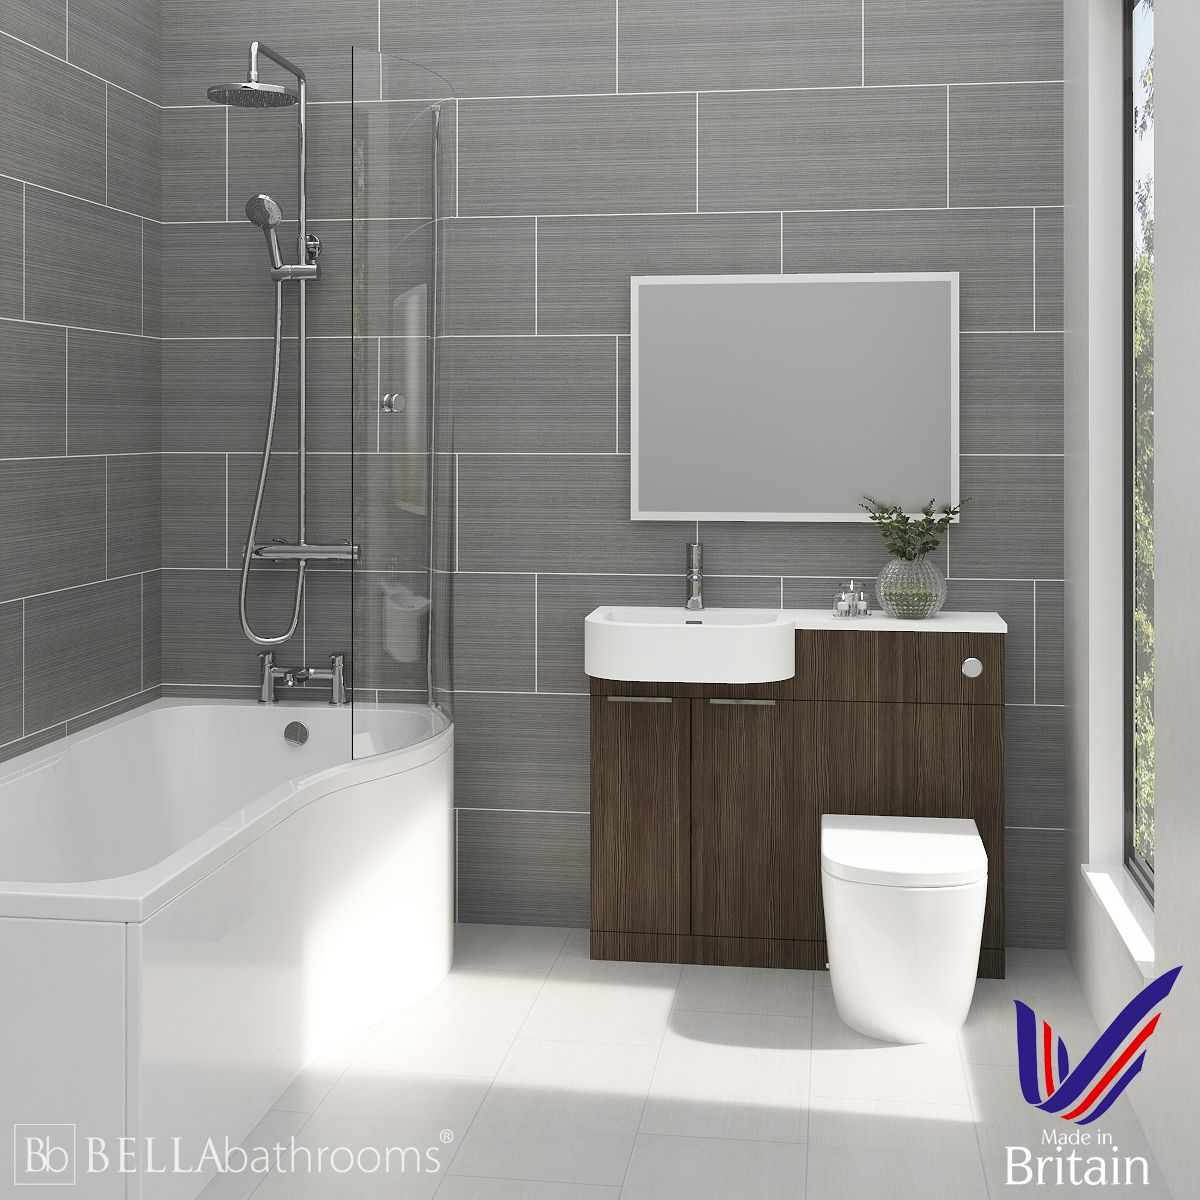 Elation Combination P Shape Bodega Grey Furniture Suite with Right Hand P Shape Shower Bath